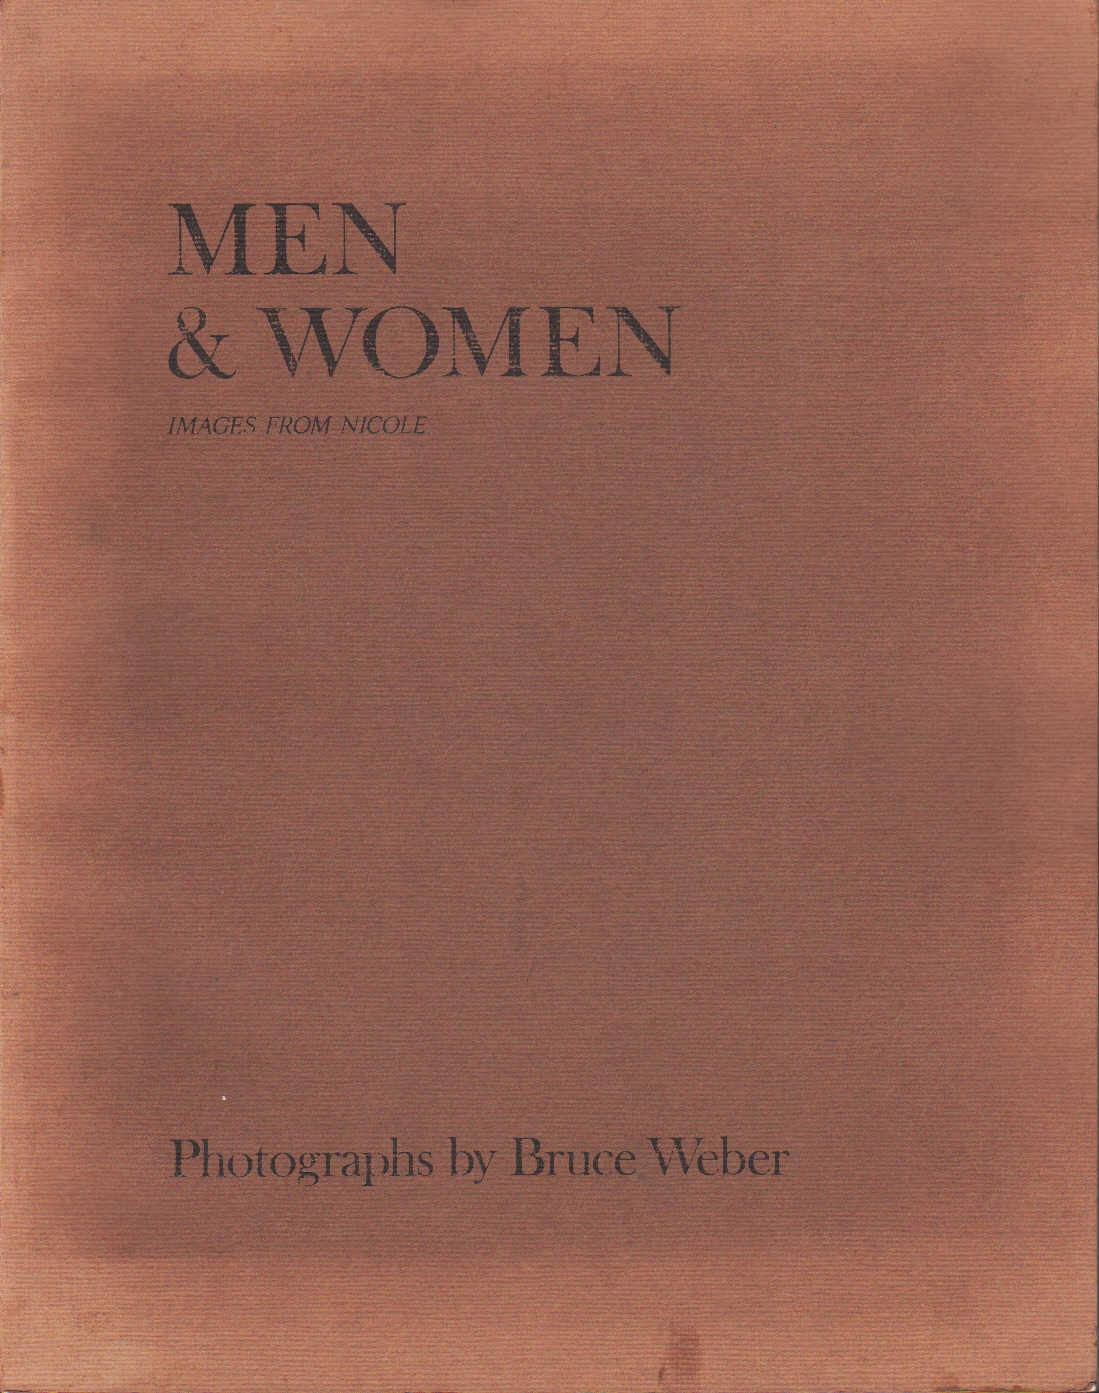 1983 | Men & Women, Bruce Weber, Nicole